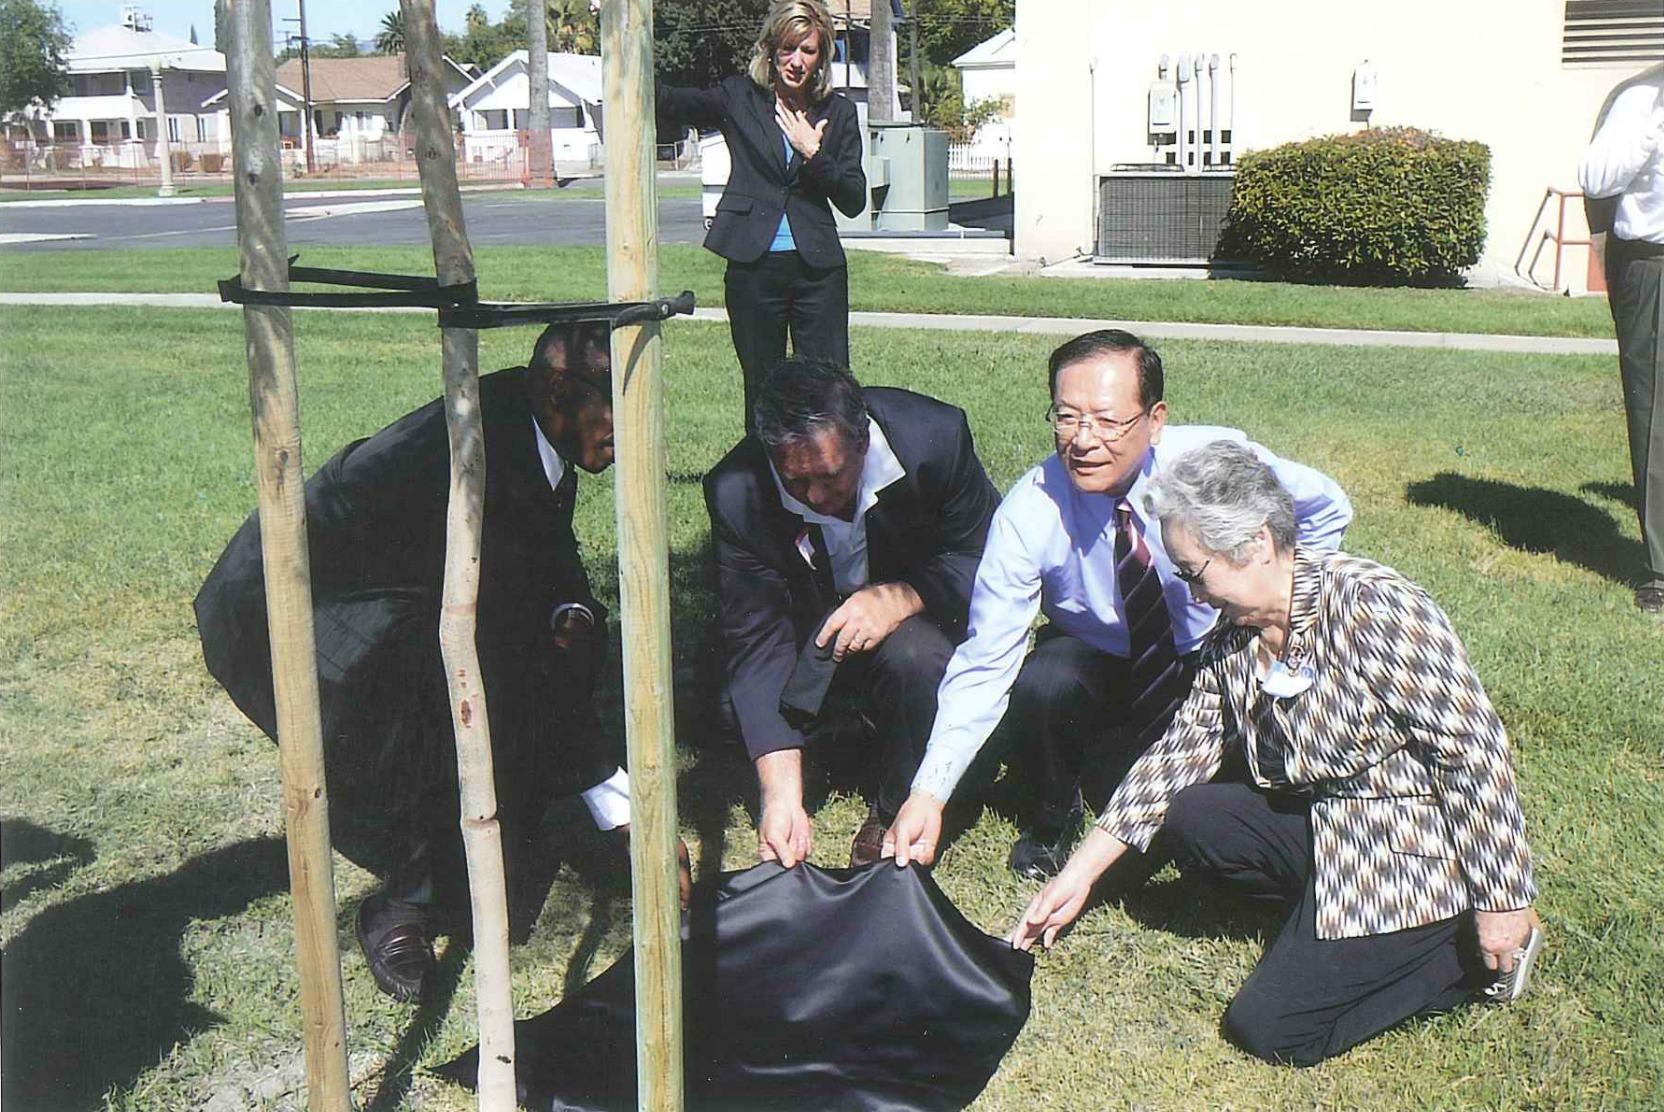 Mayor Shumizu of Tachikawa, Japan, Mrs. Keiko Sawatori and committee members from Japan at the 50th Anniversary Dedication of several Jacaranda Trees in 2010.